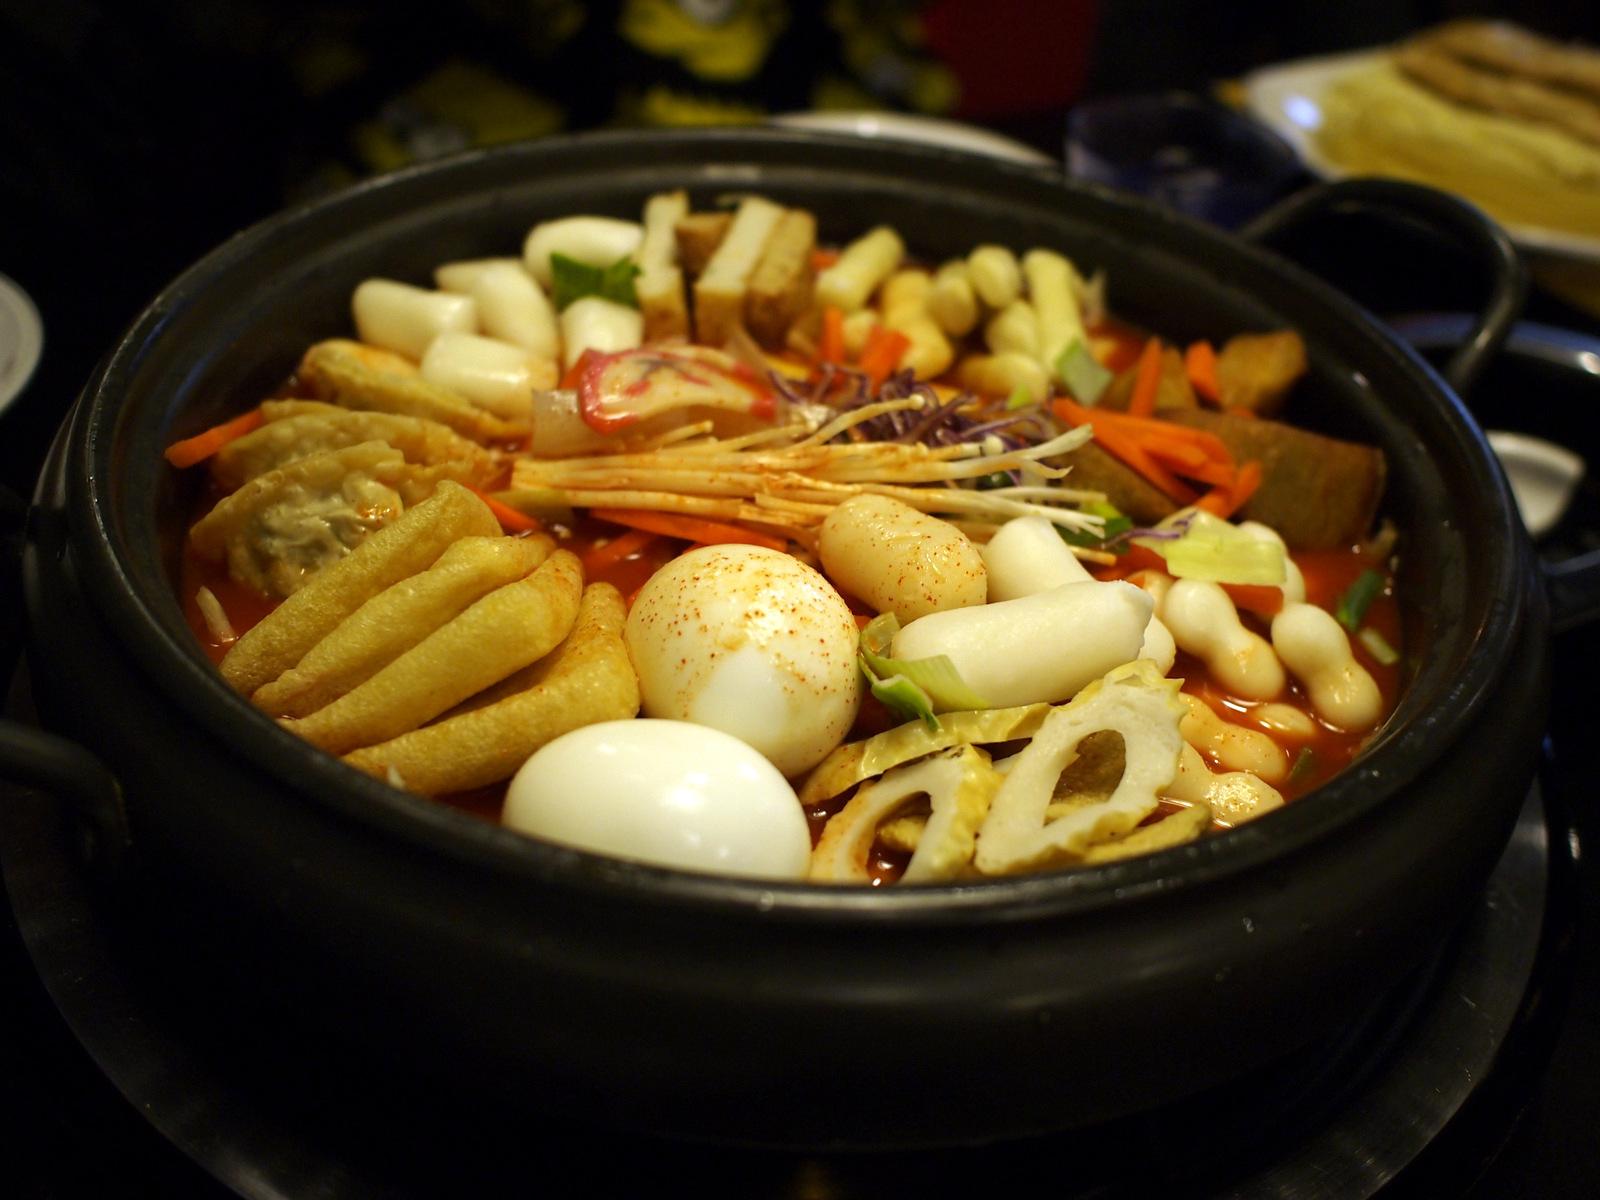 School Food Myeongdong Menu